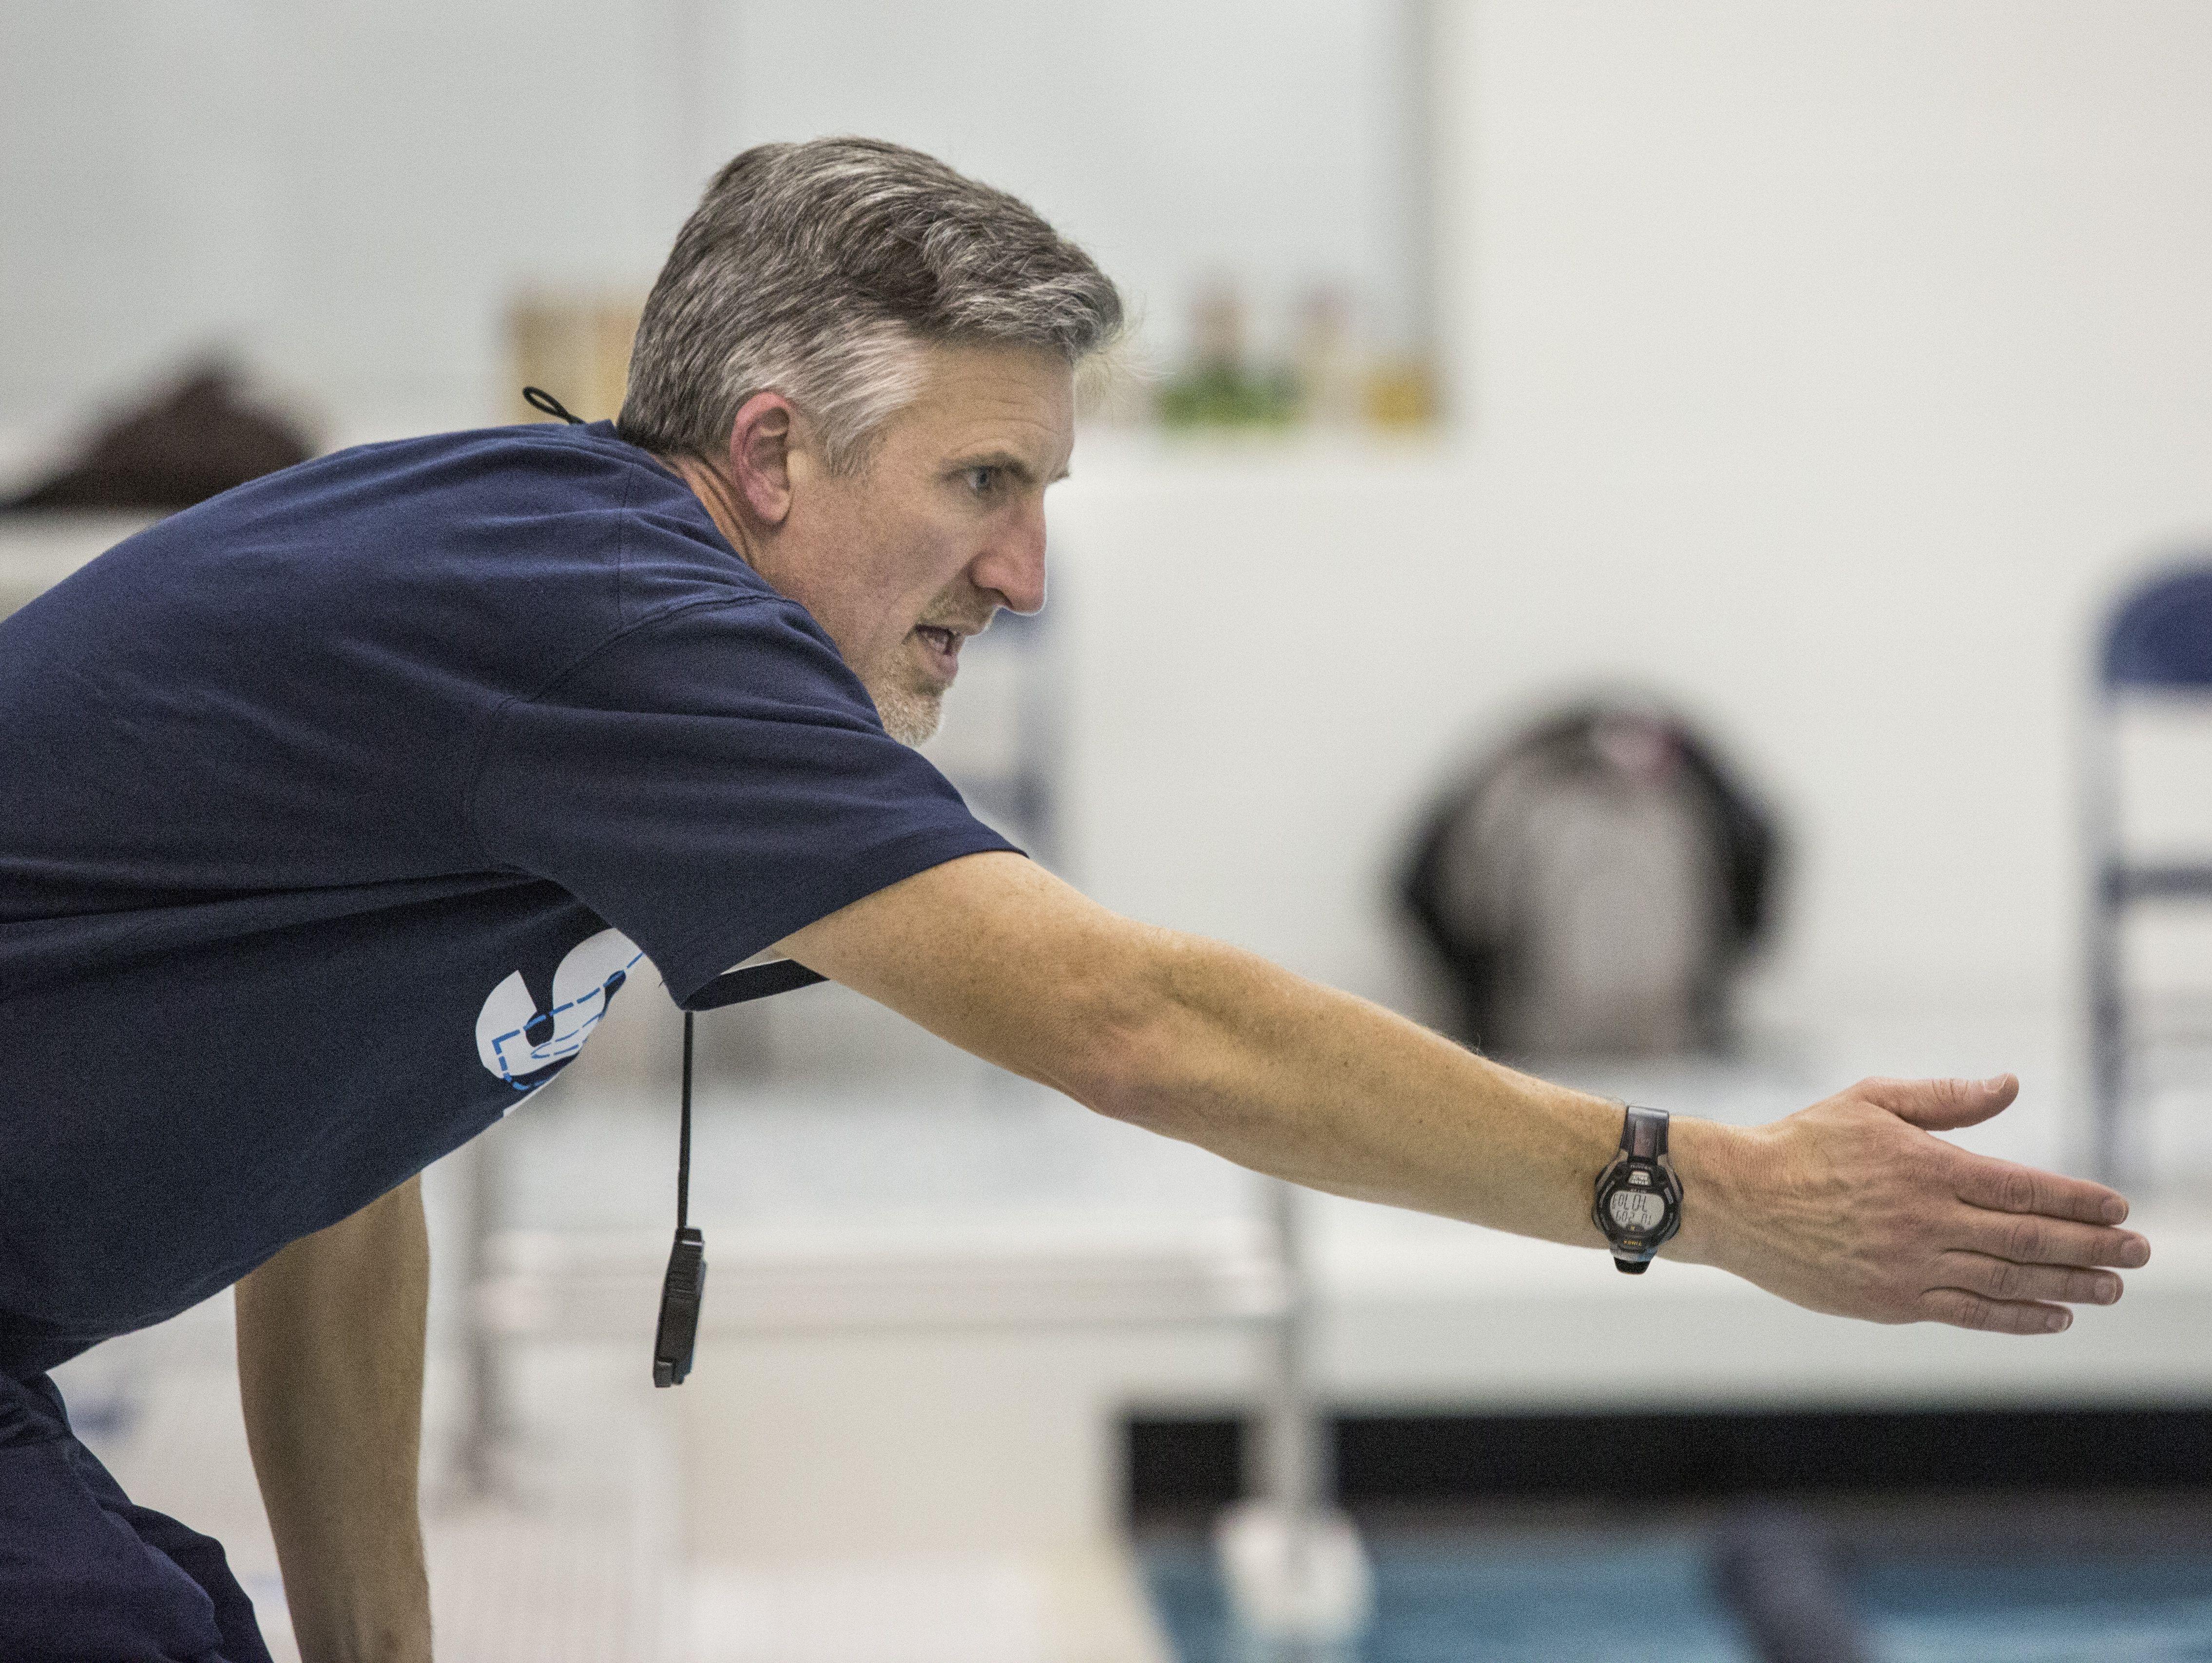 Marysville coach Steve Rogers yells to swimmer during a swim meet Tuesday, Feb. 9, 2016 at Marysville High School.